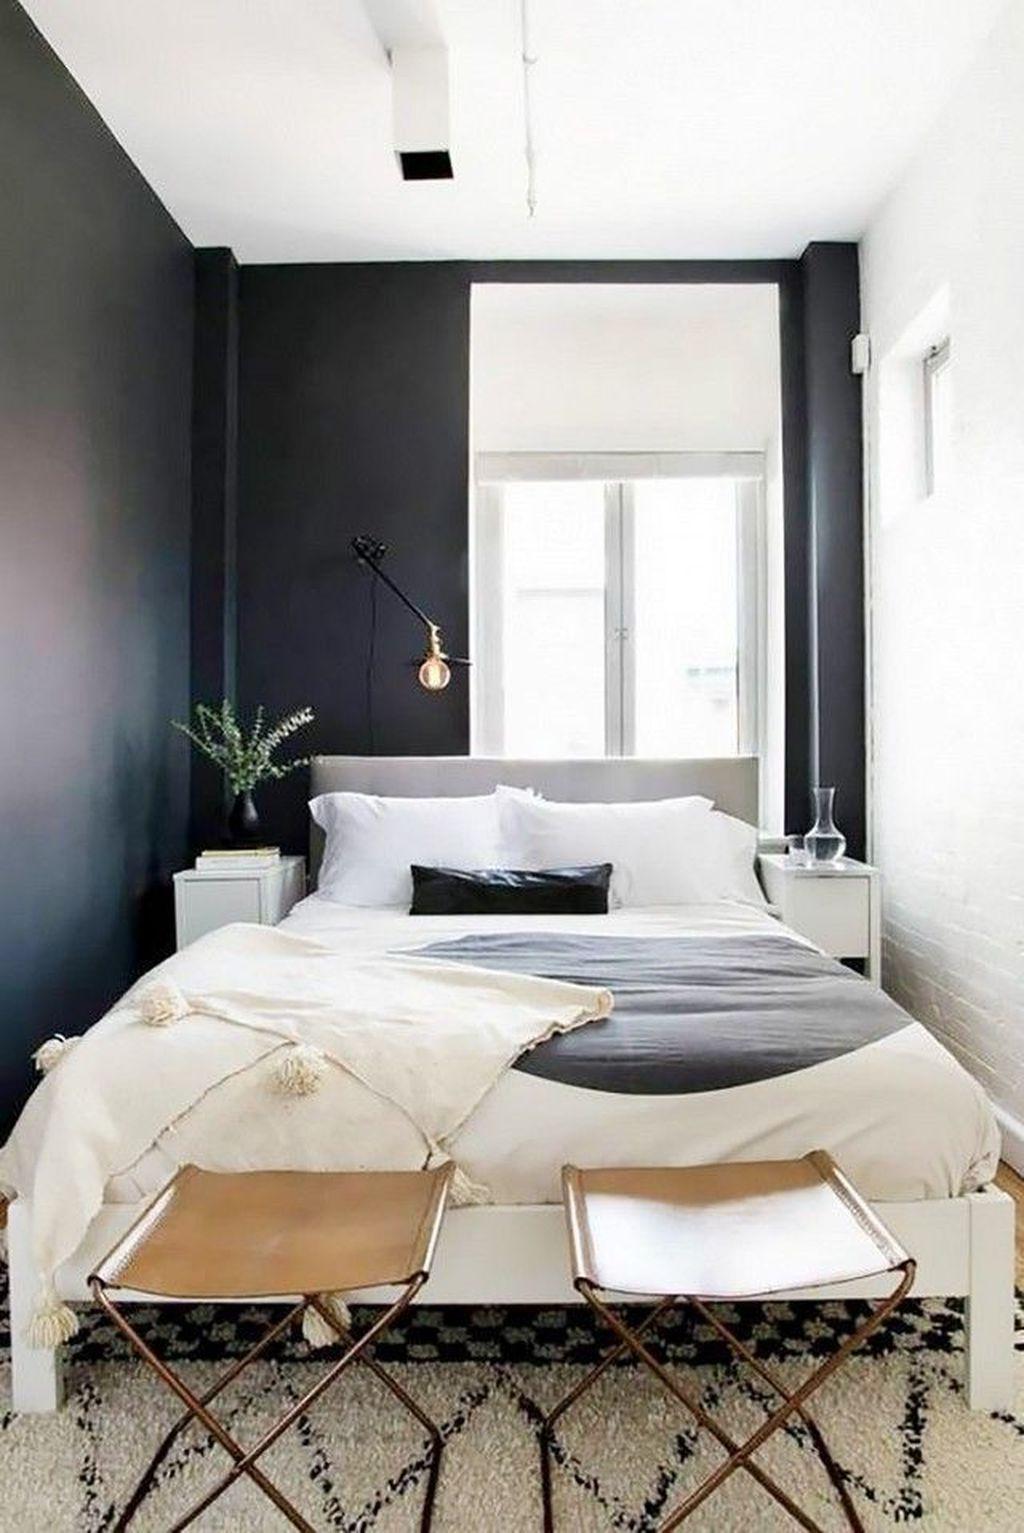 31 Admirable Tiny Bedroom Design Ideas Pimphomee Small Master Bedroom Bedroom Interior Tiny Bedroom